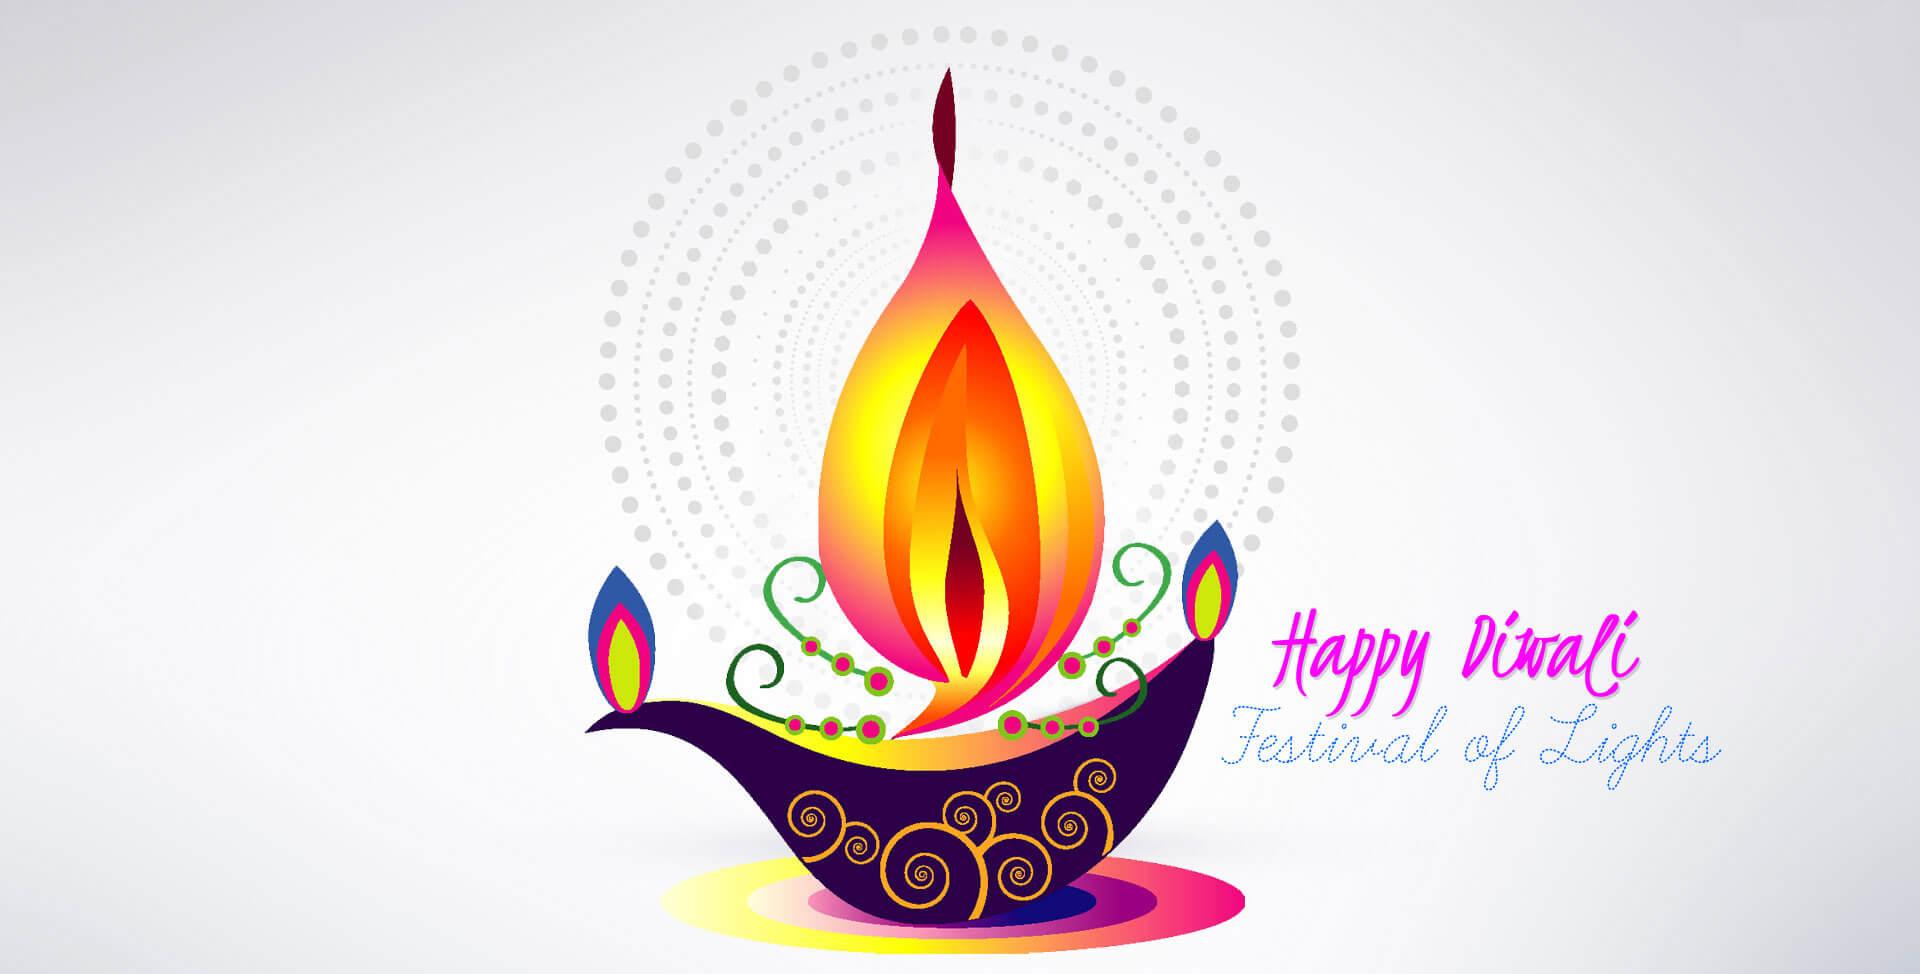 Happy Diwali with diya light greeting card wallpaper image